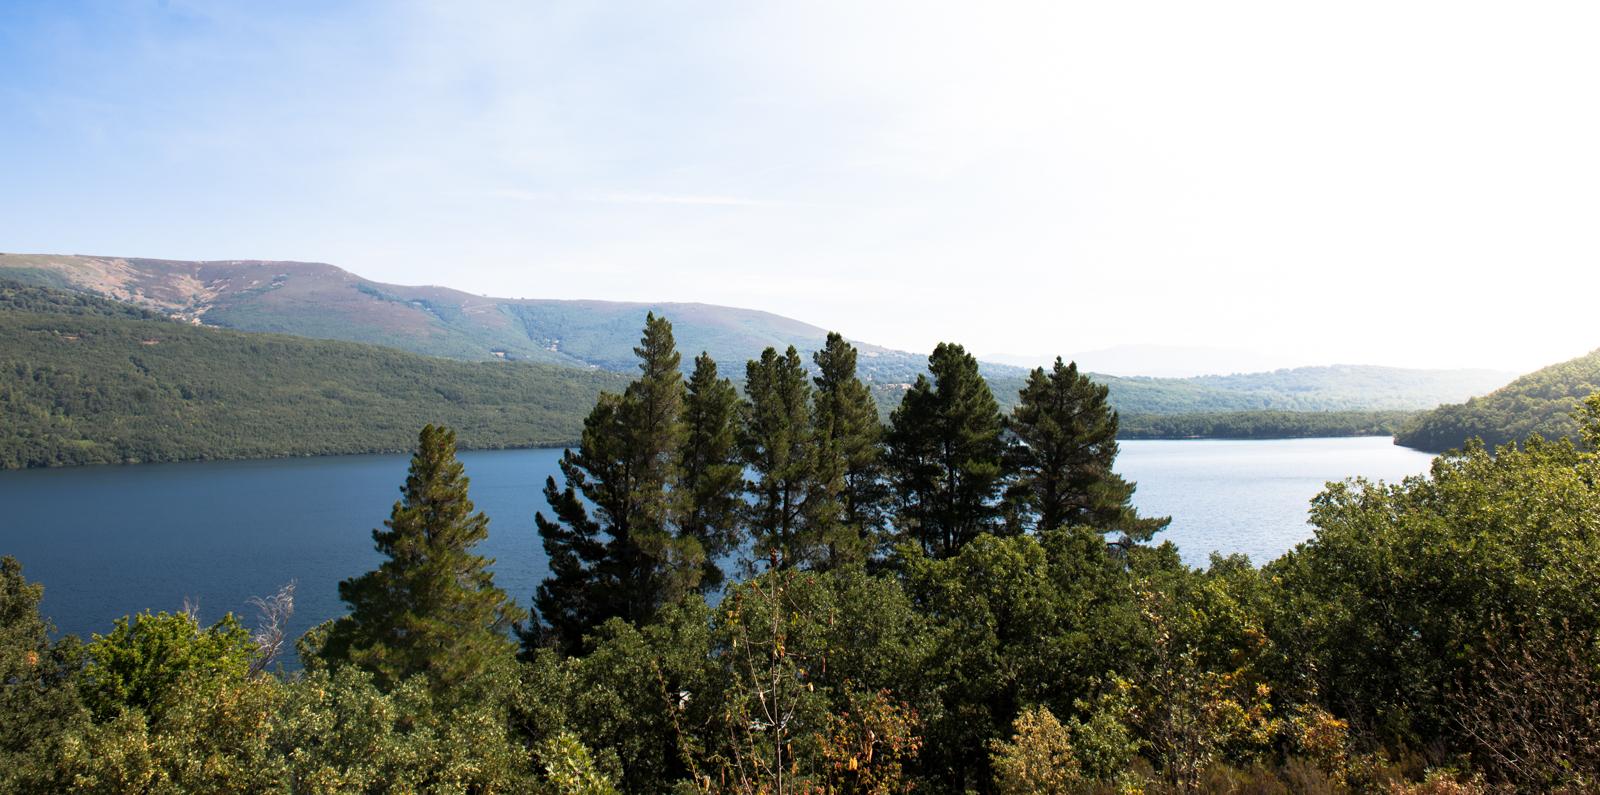 Lago_de_Sanabria-1.jpg